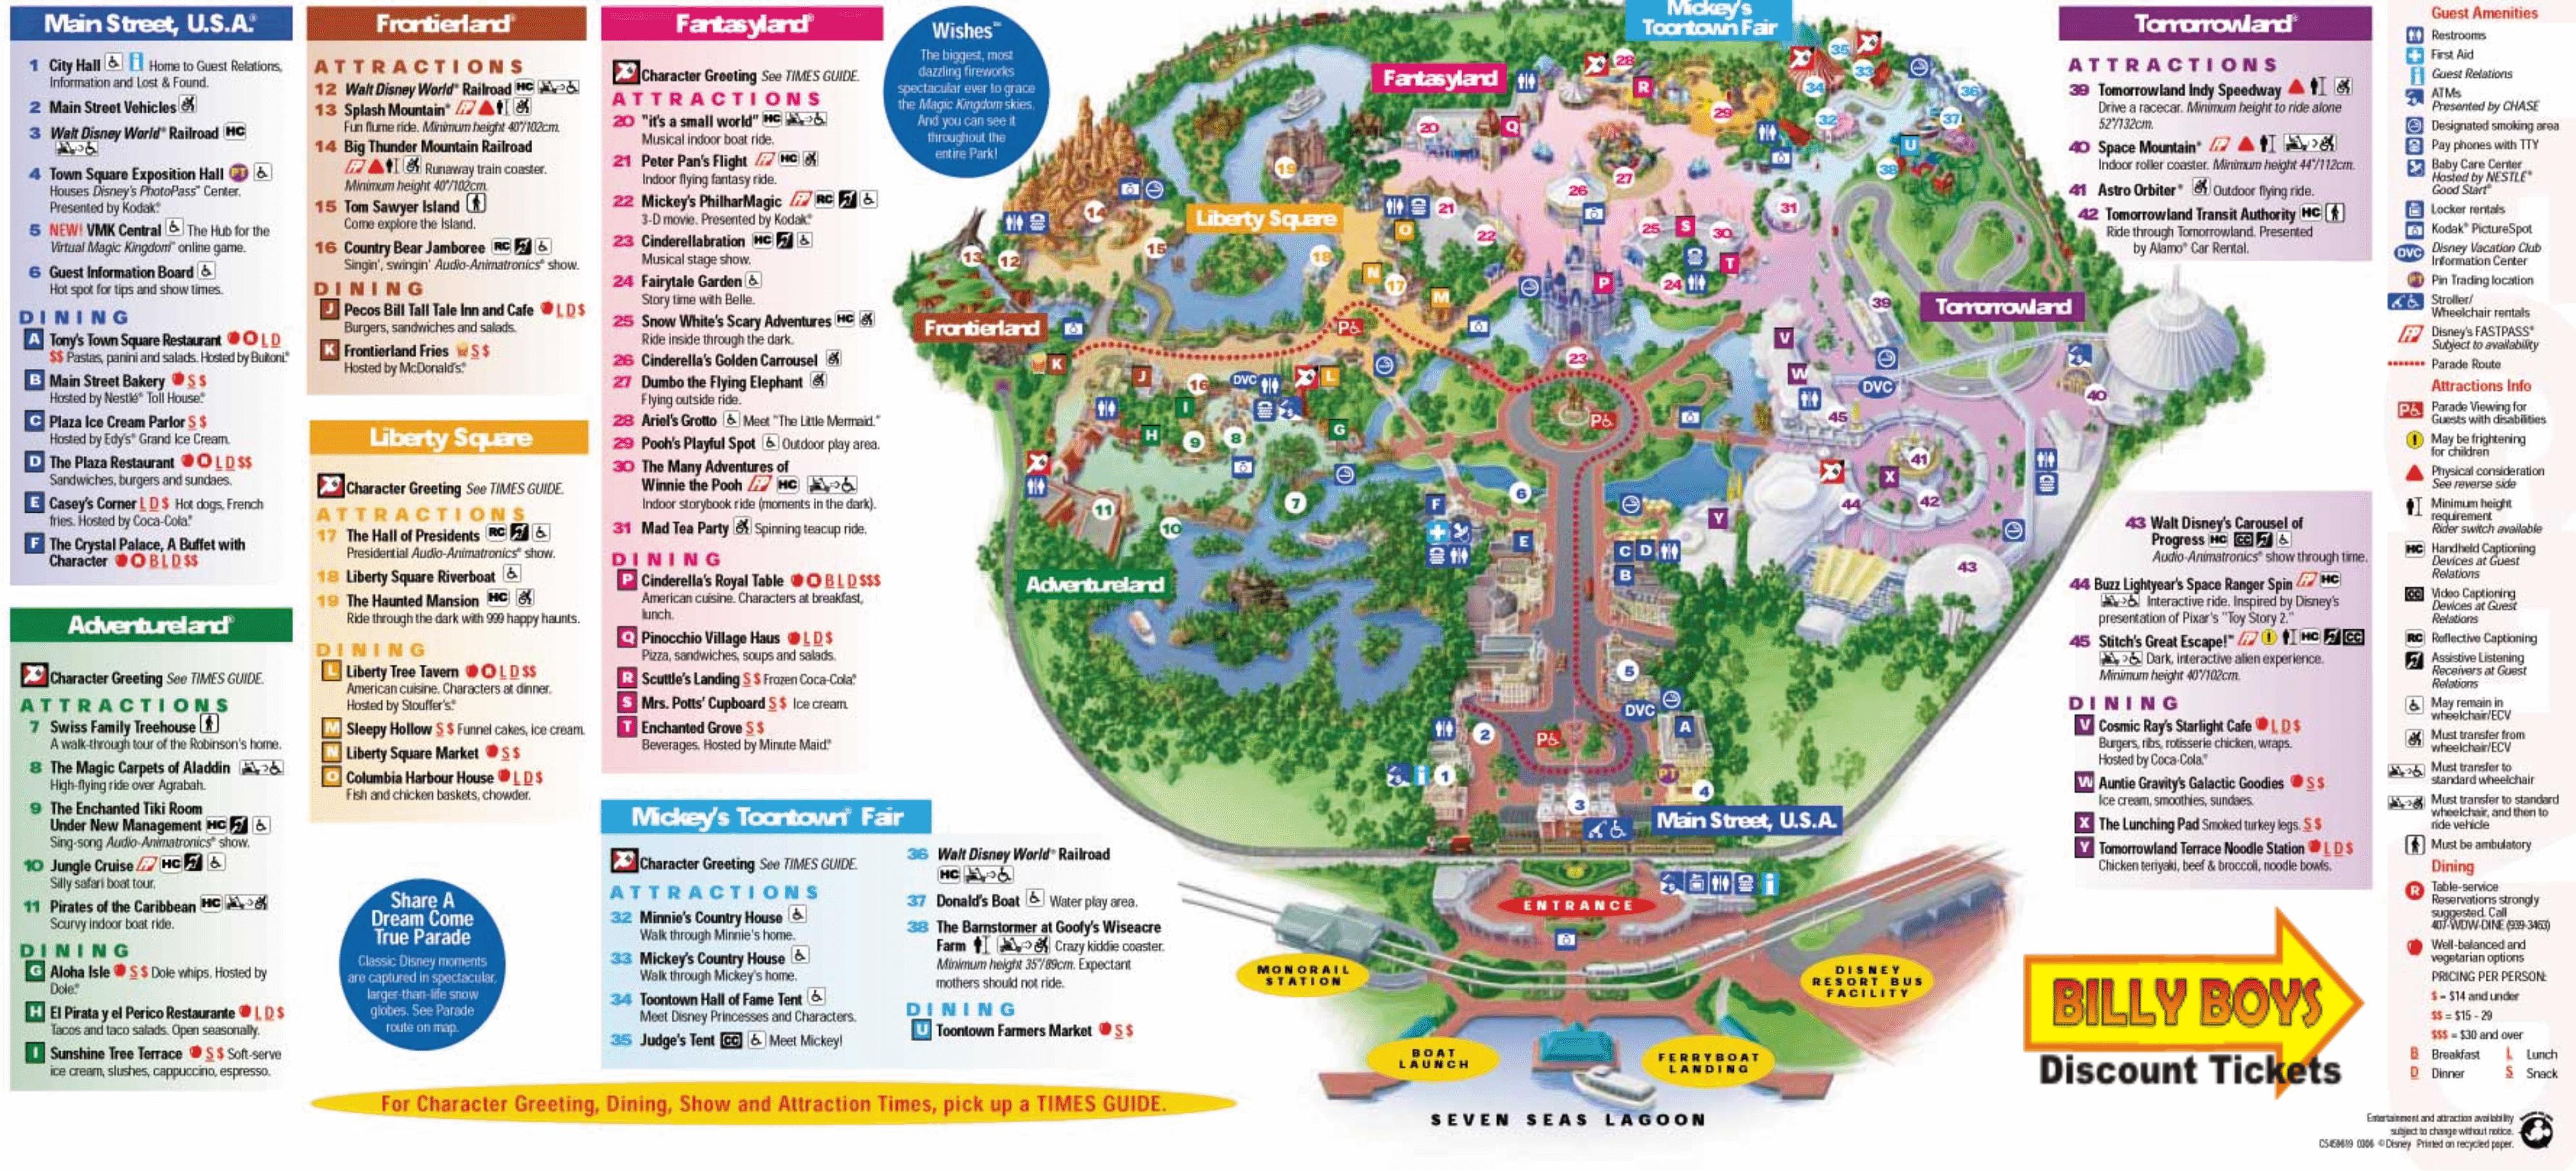 Disney World Florida Map From Ambergontrail 3 - Judecelestin2010 - Disney Orlando Florida Map